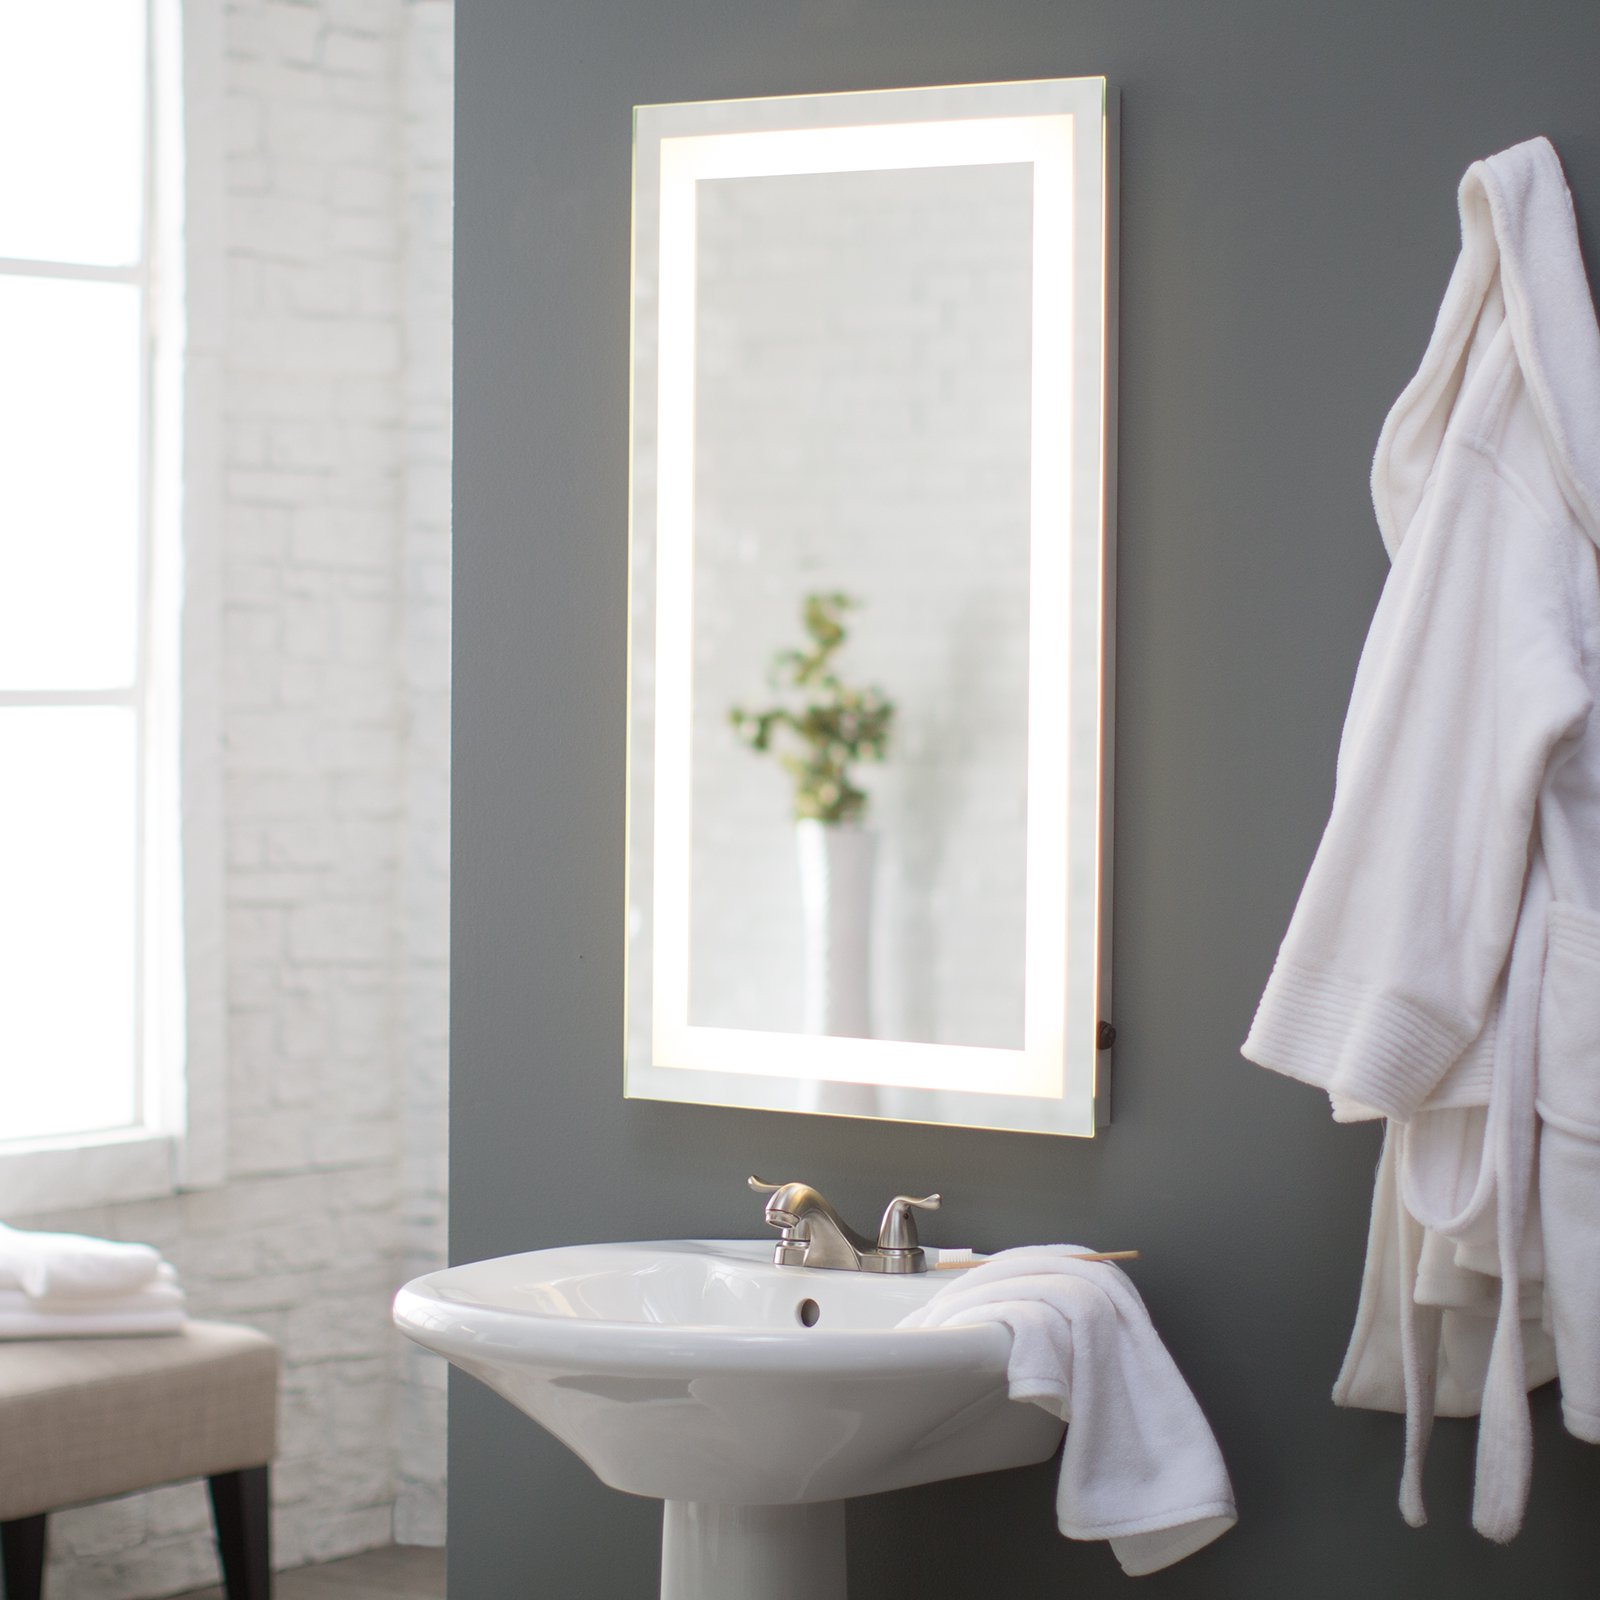 Bathroom Mirrors Backlit afina illume led backlit rectangular bathroom mirror - walmart